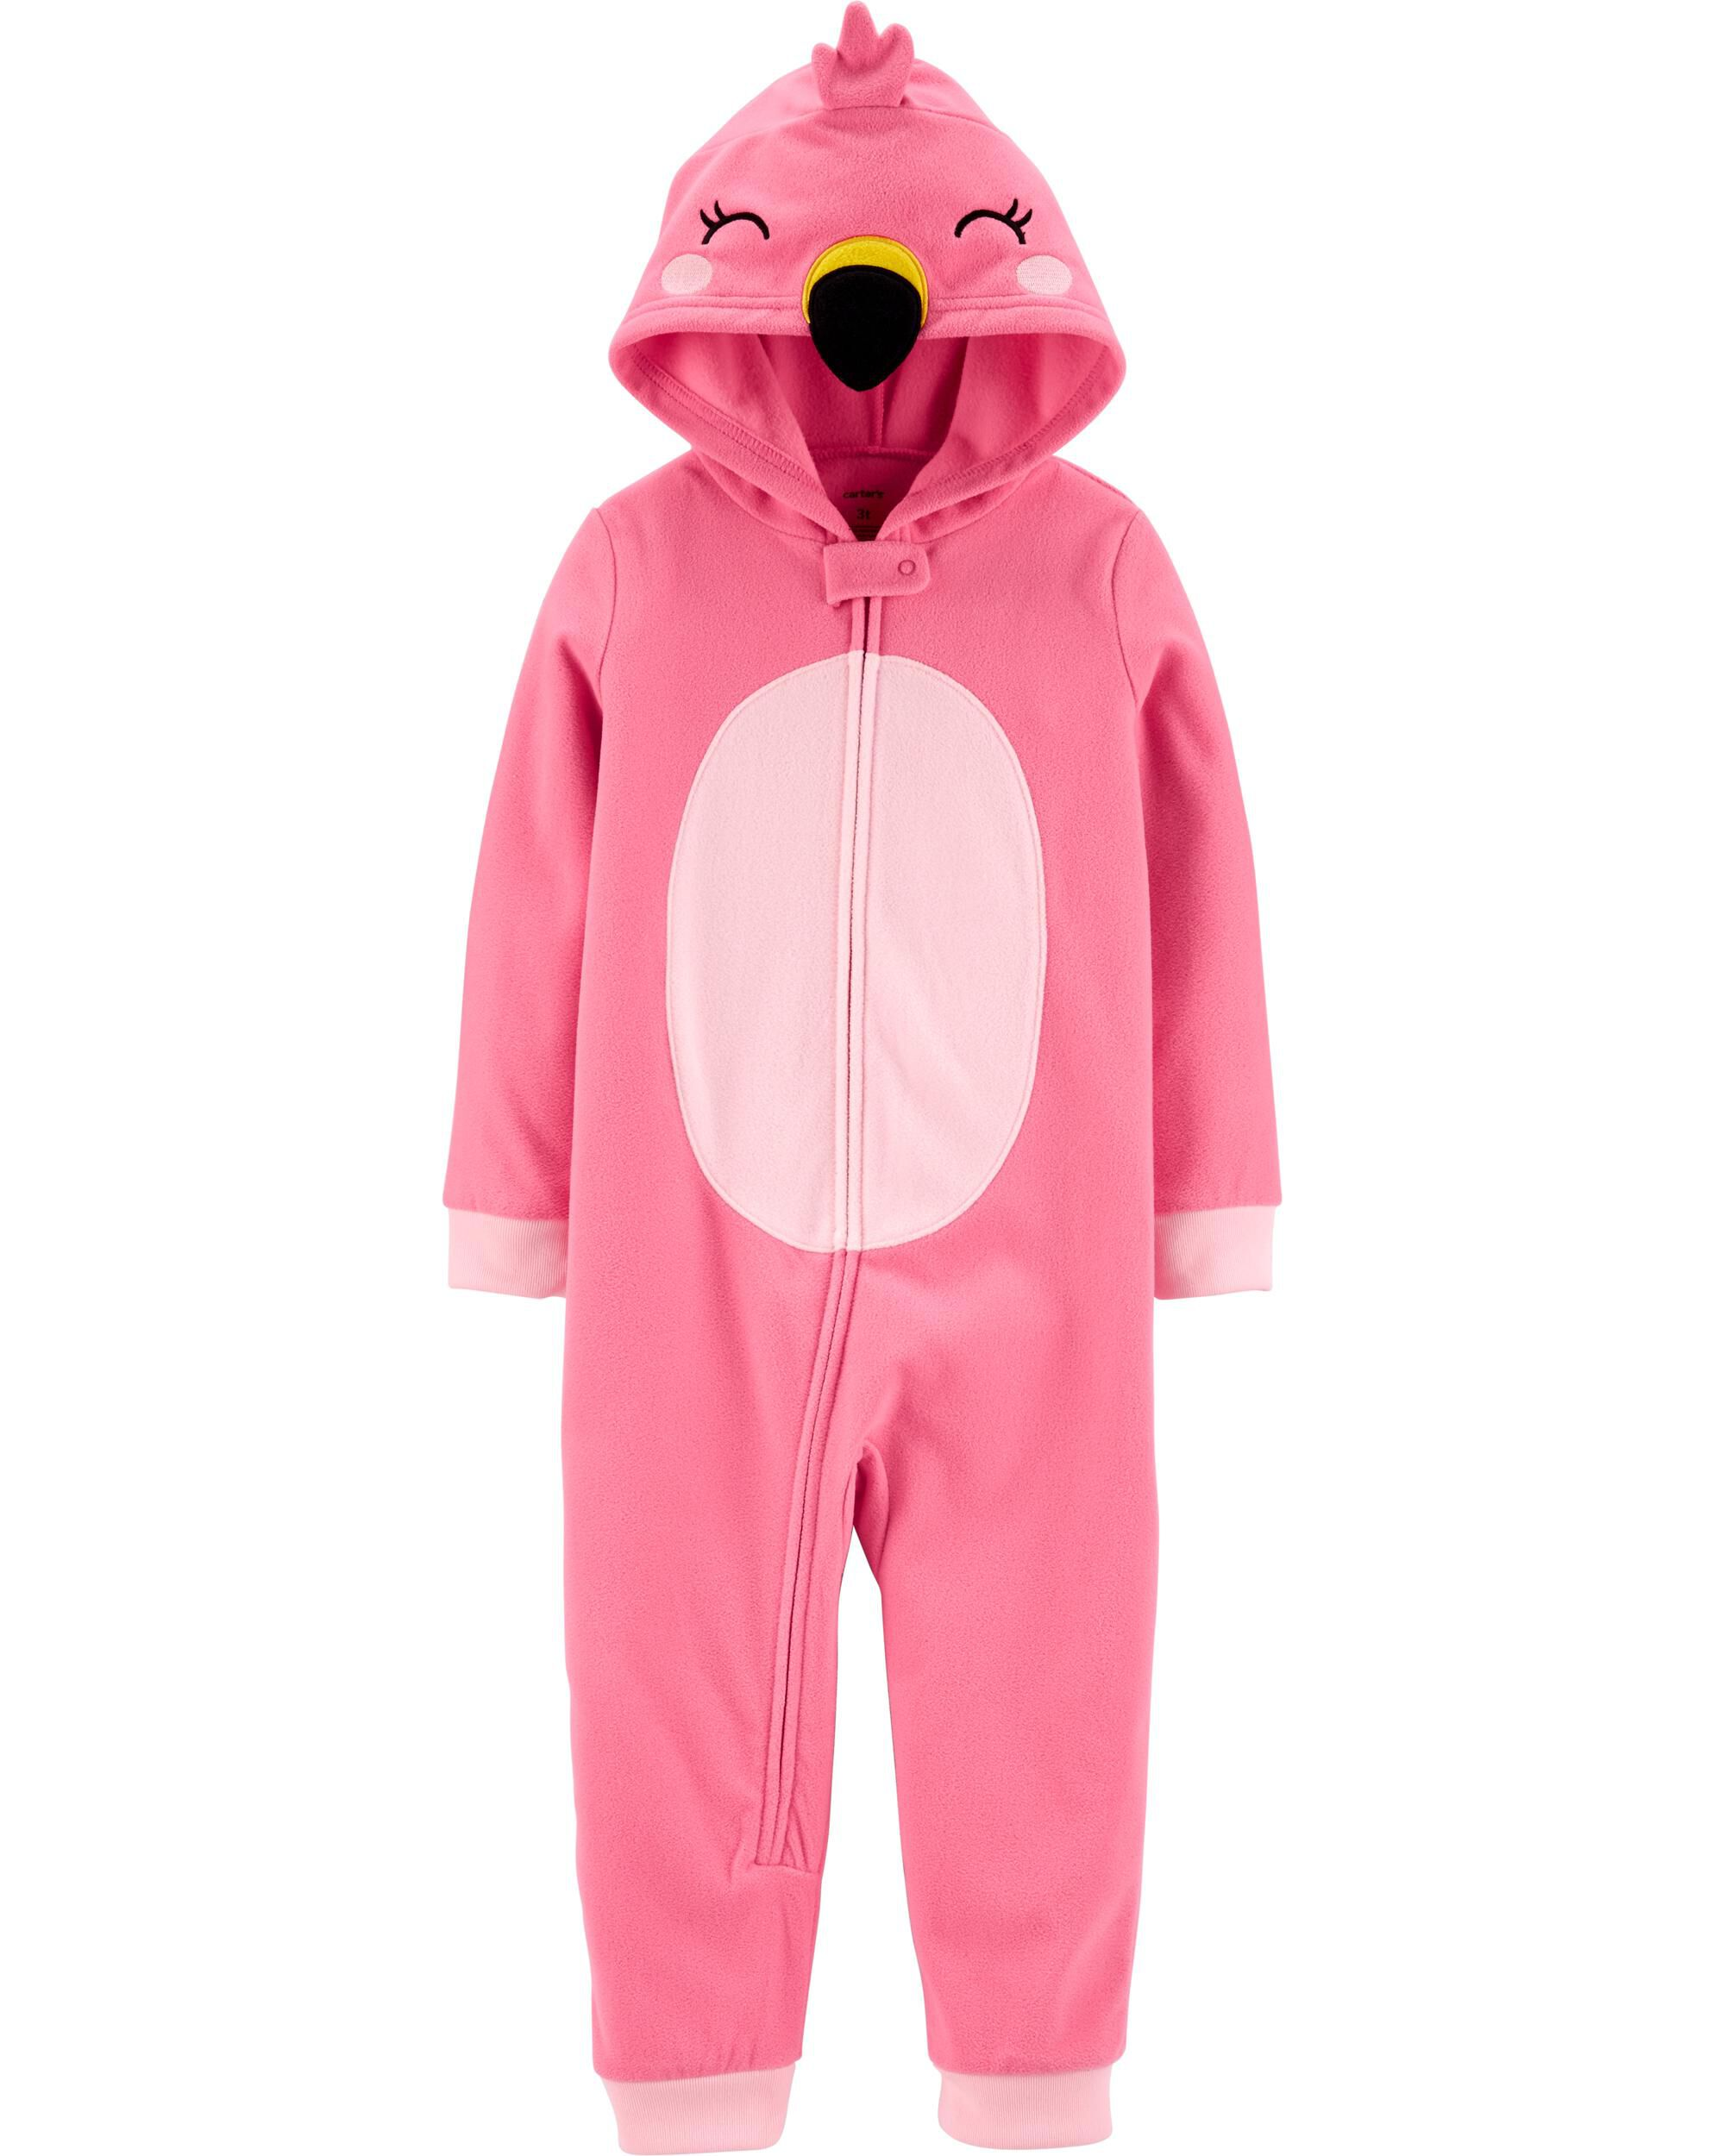 *CLEARANCE* 1-Piece Flamingo Hooded Fleece Footless PJs